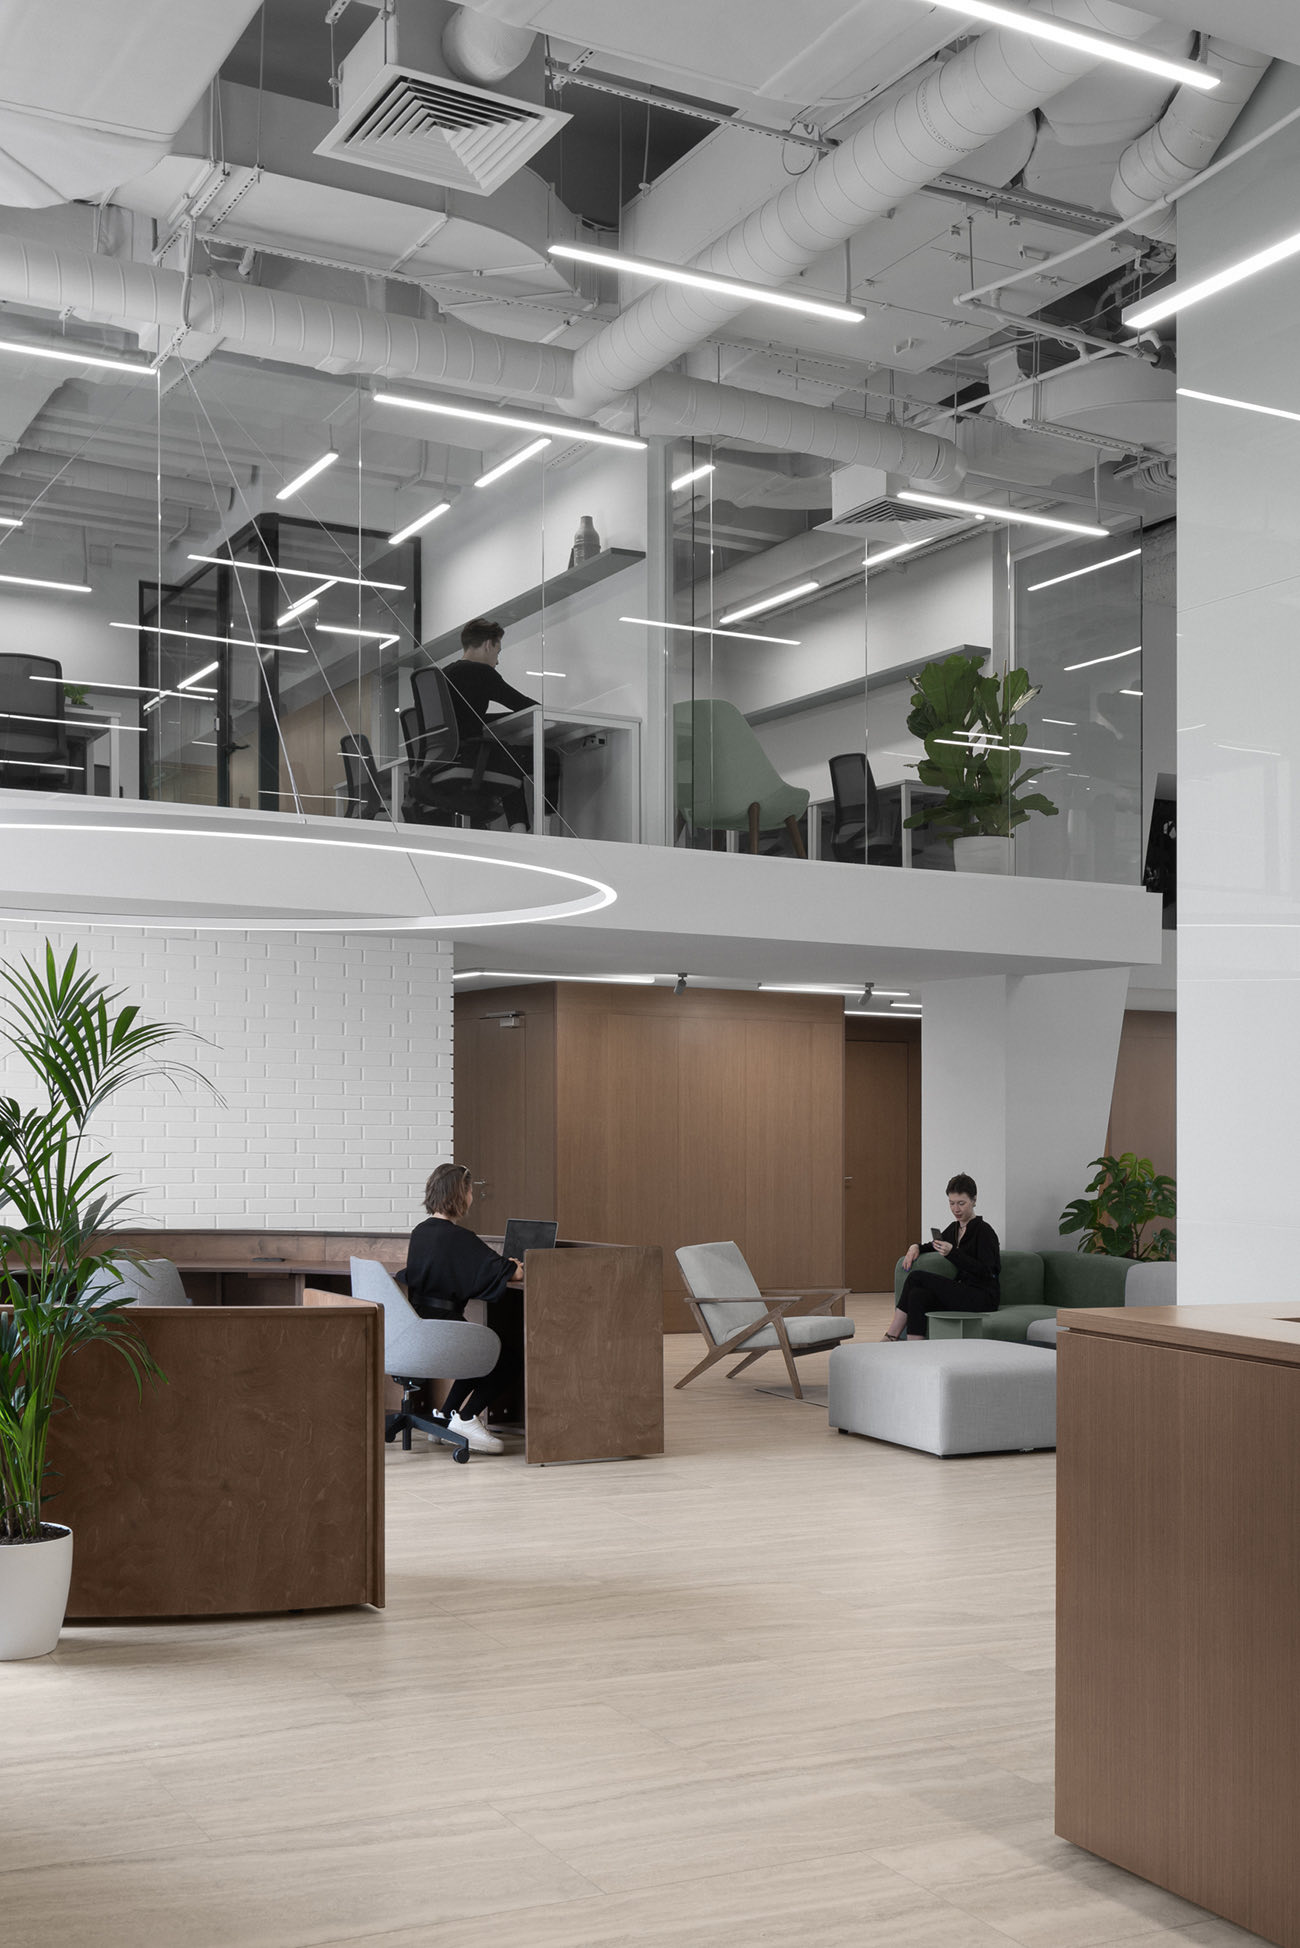 A Tour Of Praktik's Moscow Coworking Space